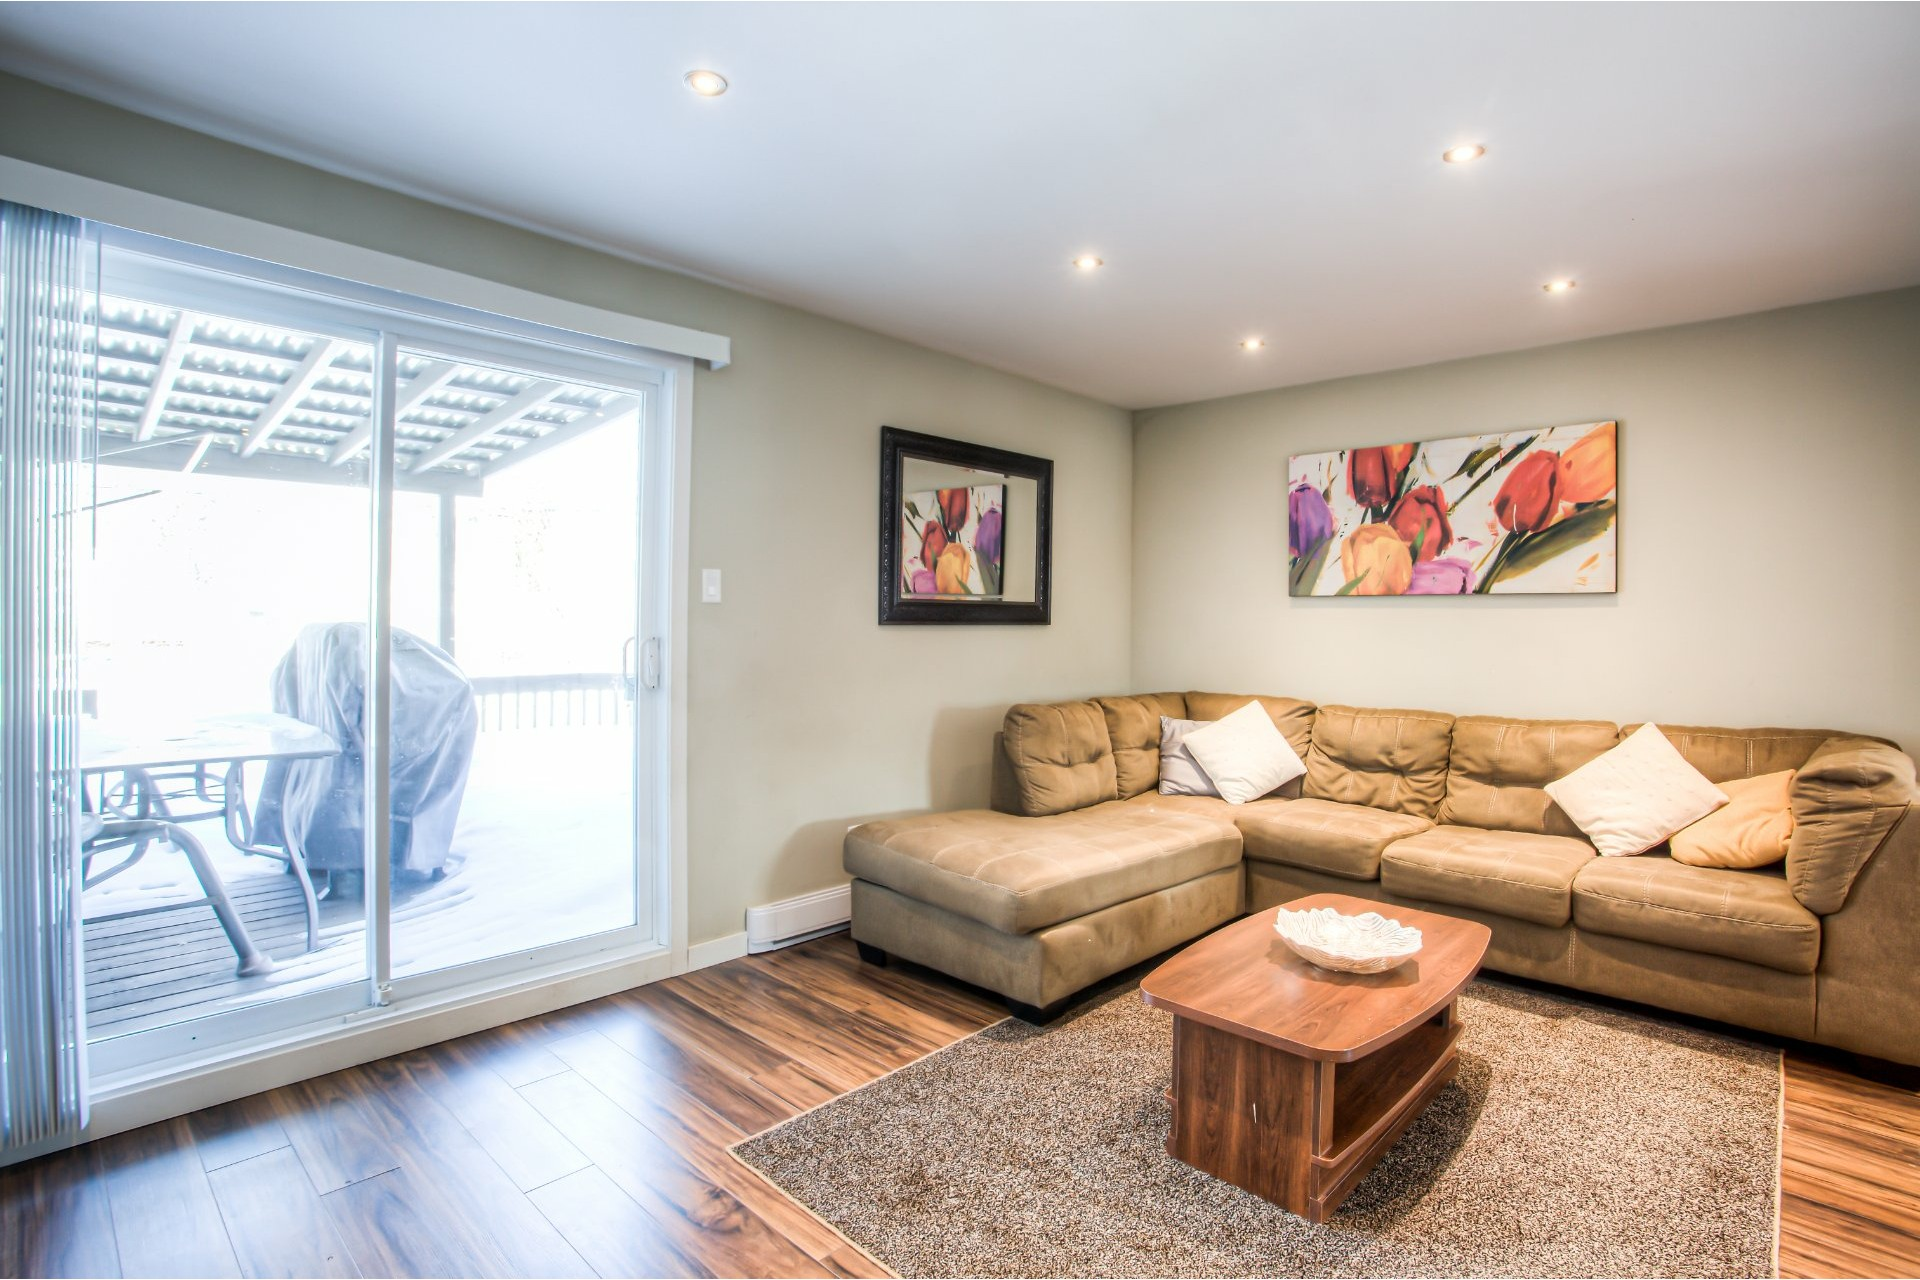 image 6 - House For rent Pierrefonds-Roxboro Montréal  - 9 rooms